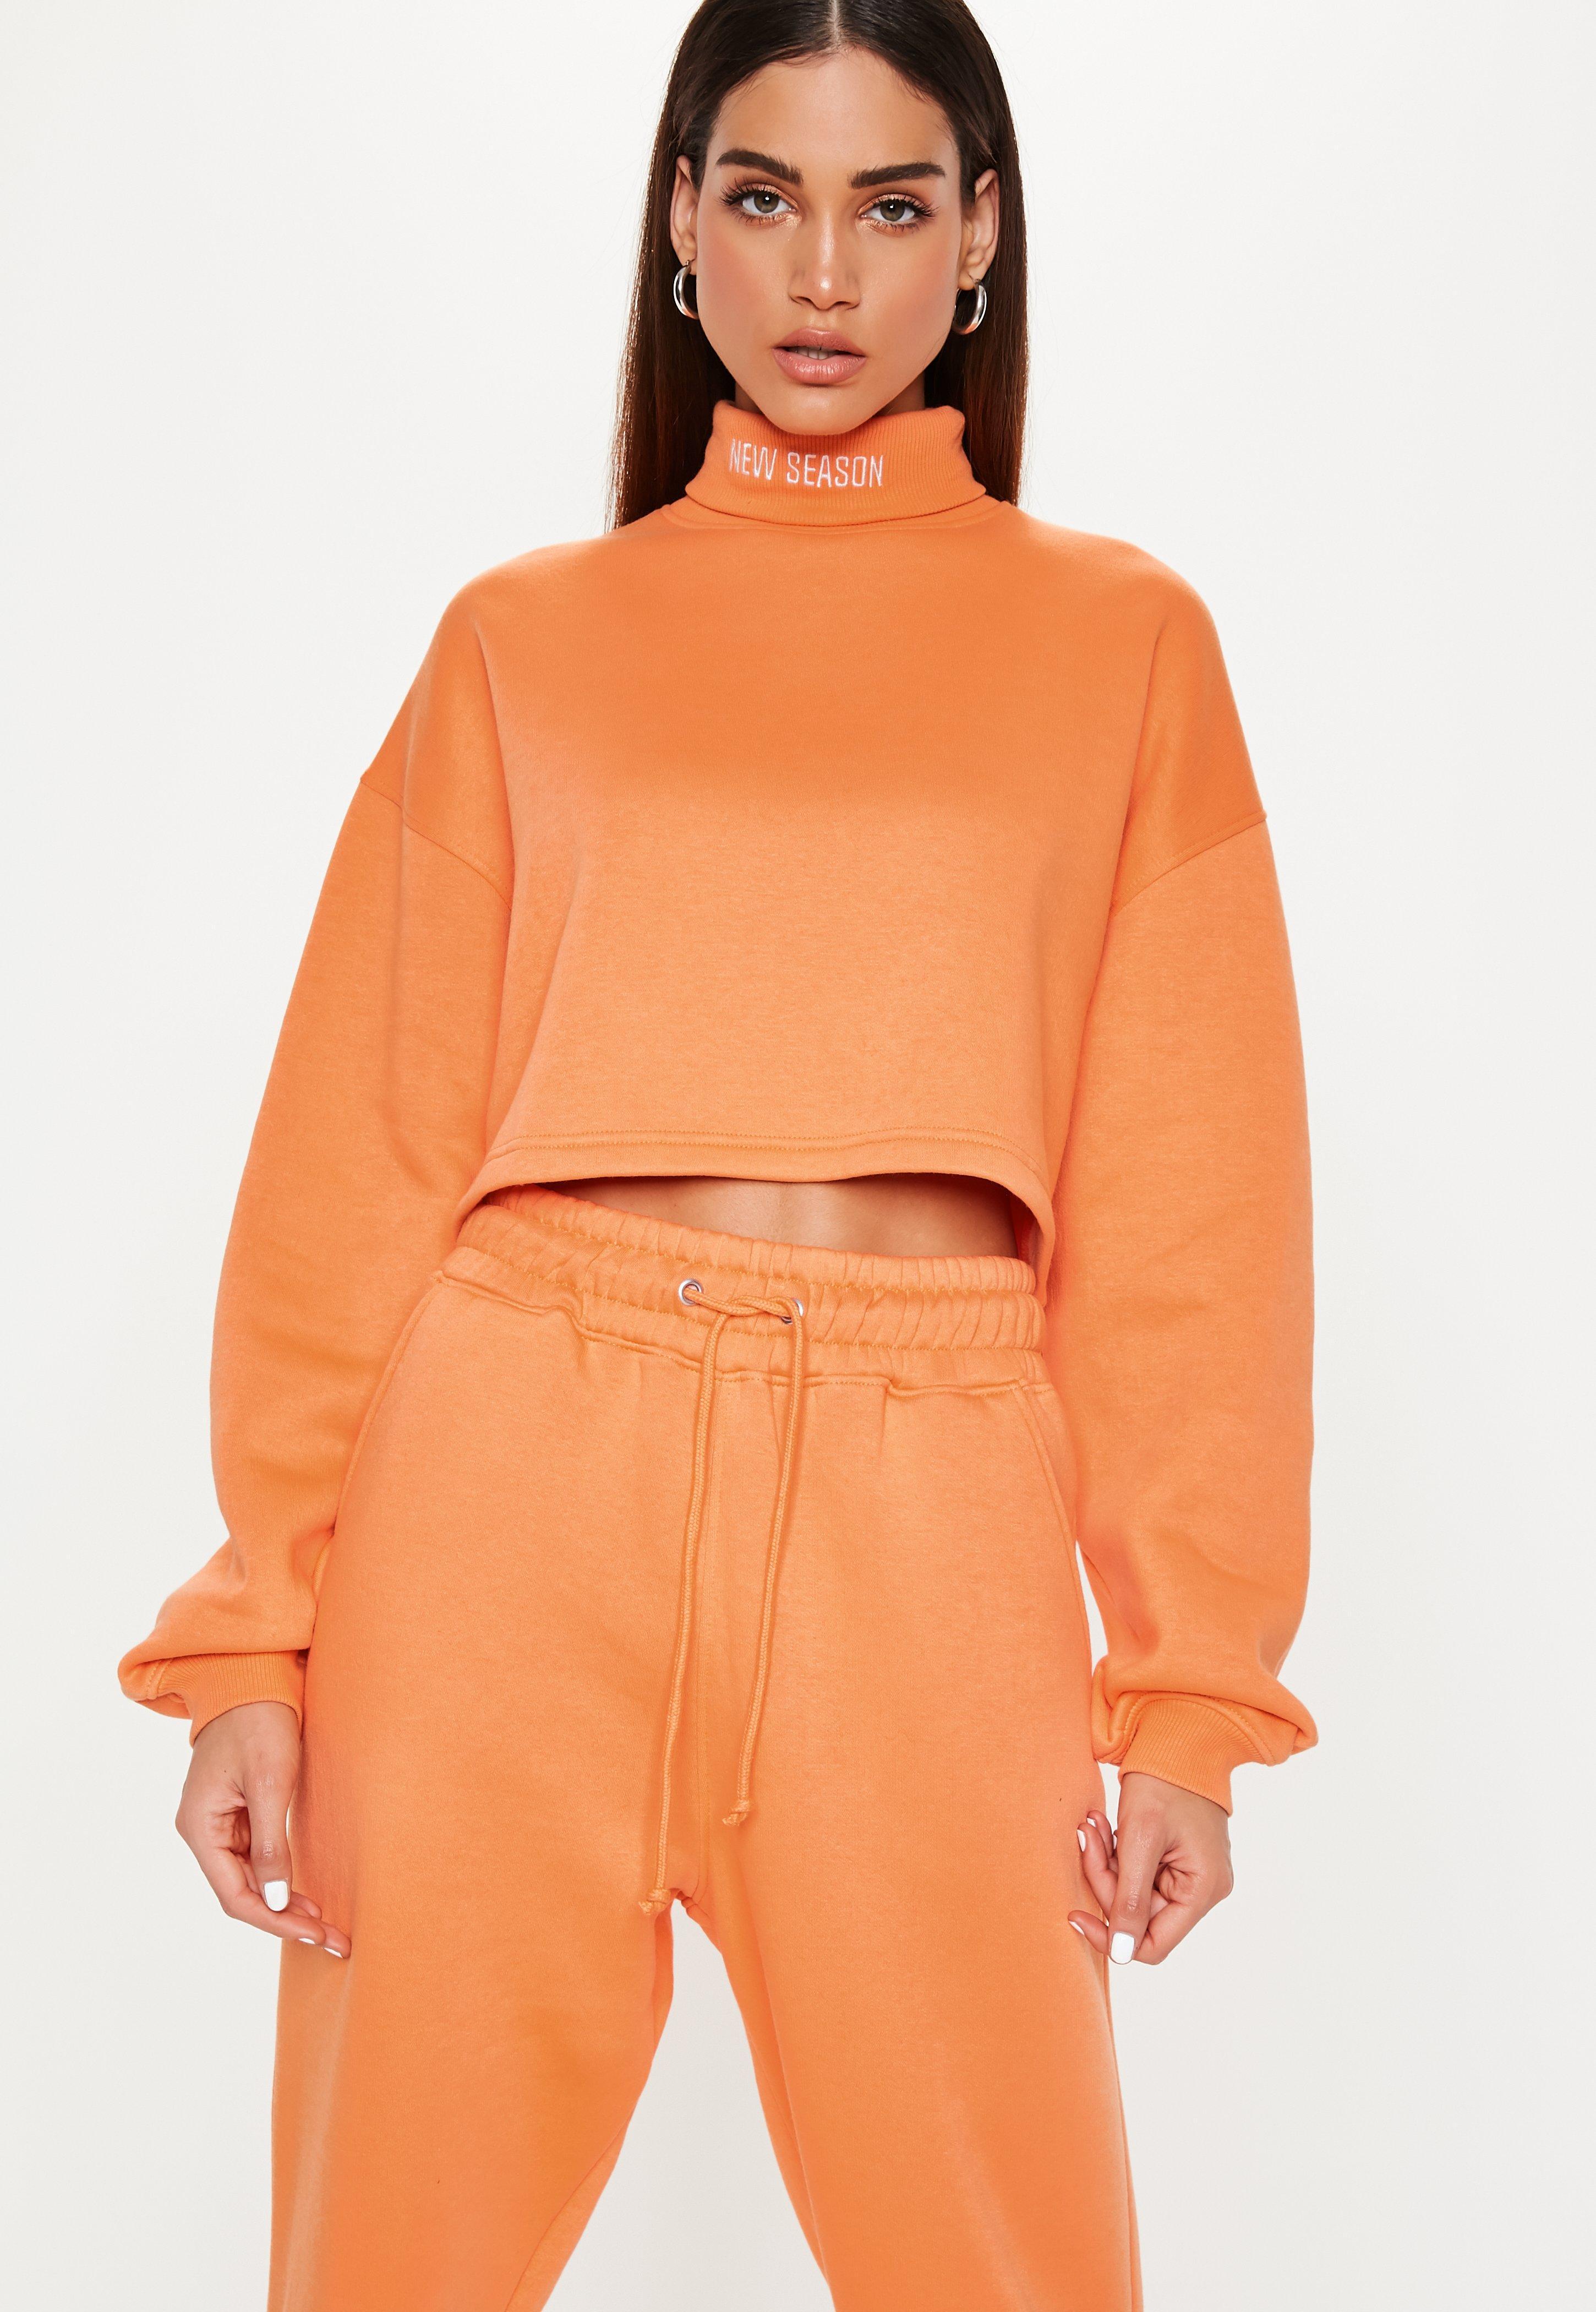 Missguided Neon Orange New Season Roll Neck Sweatshirt in Orange - Lyst